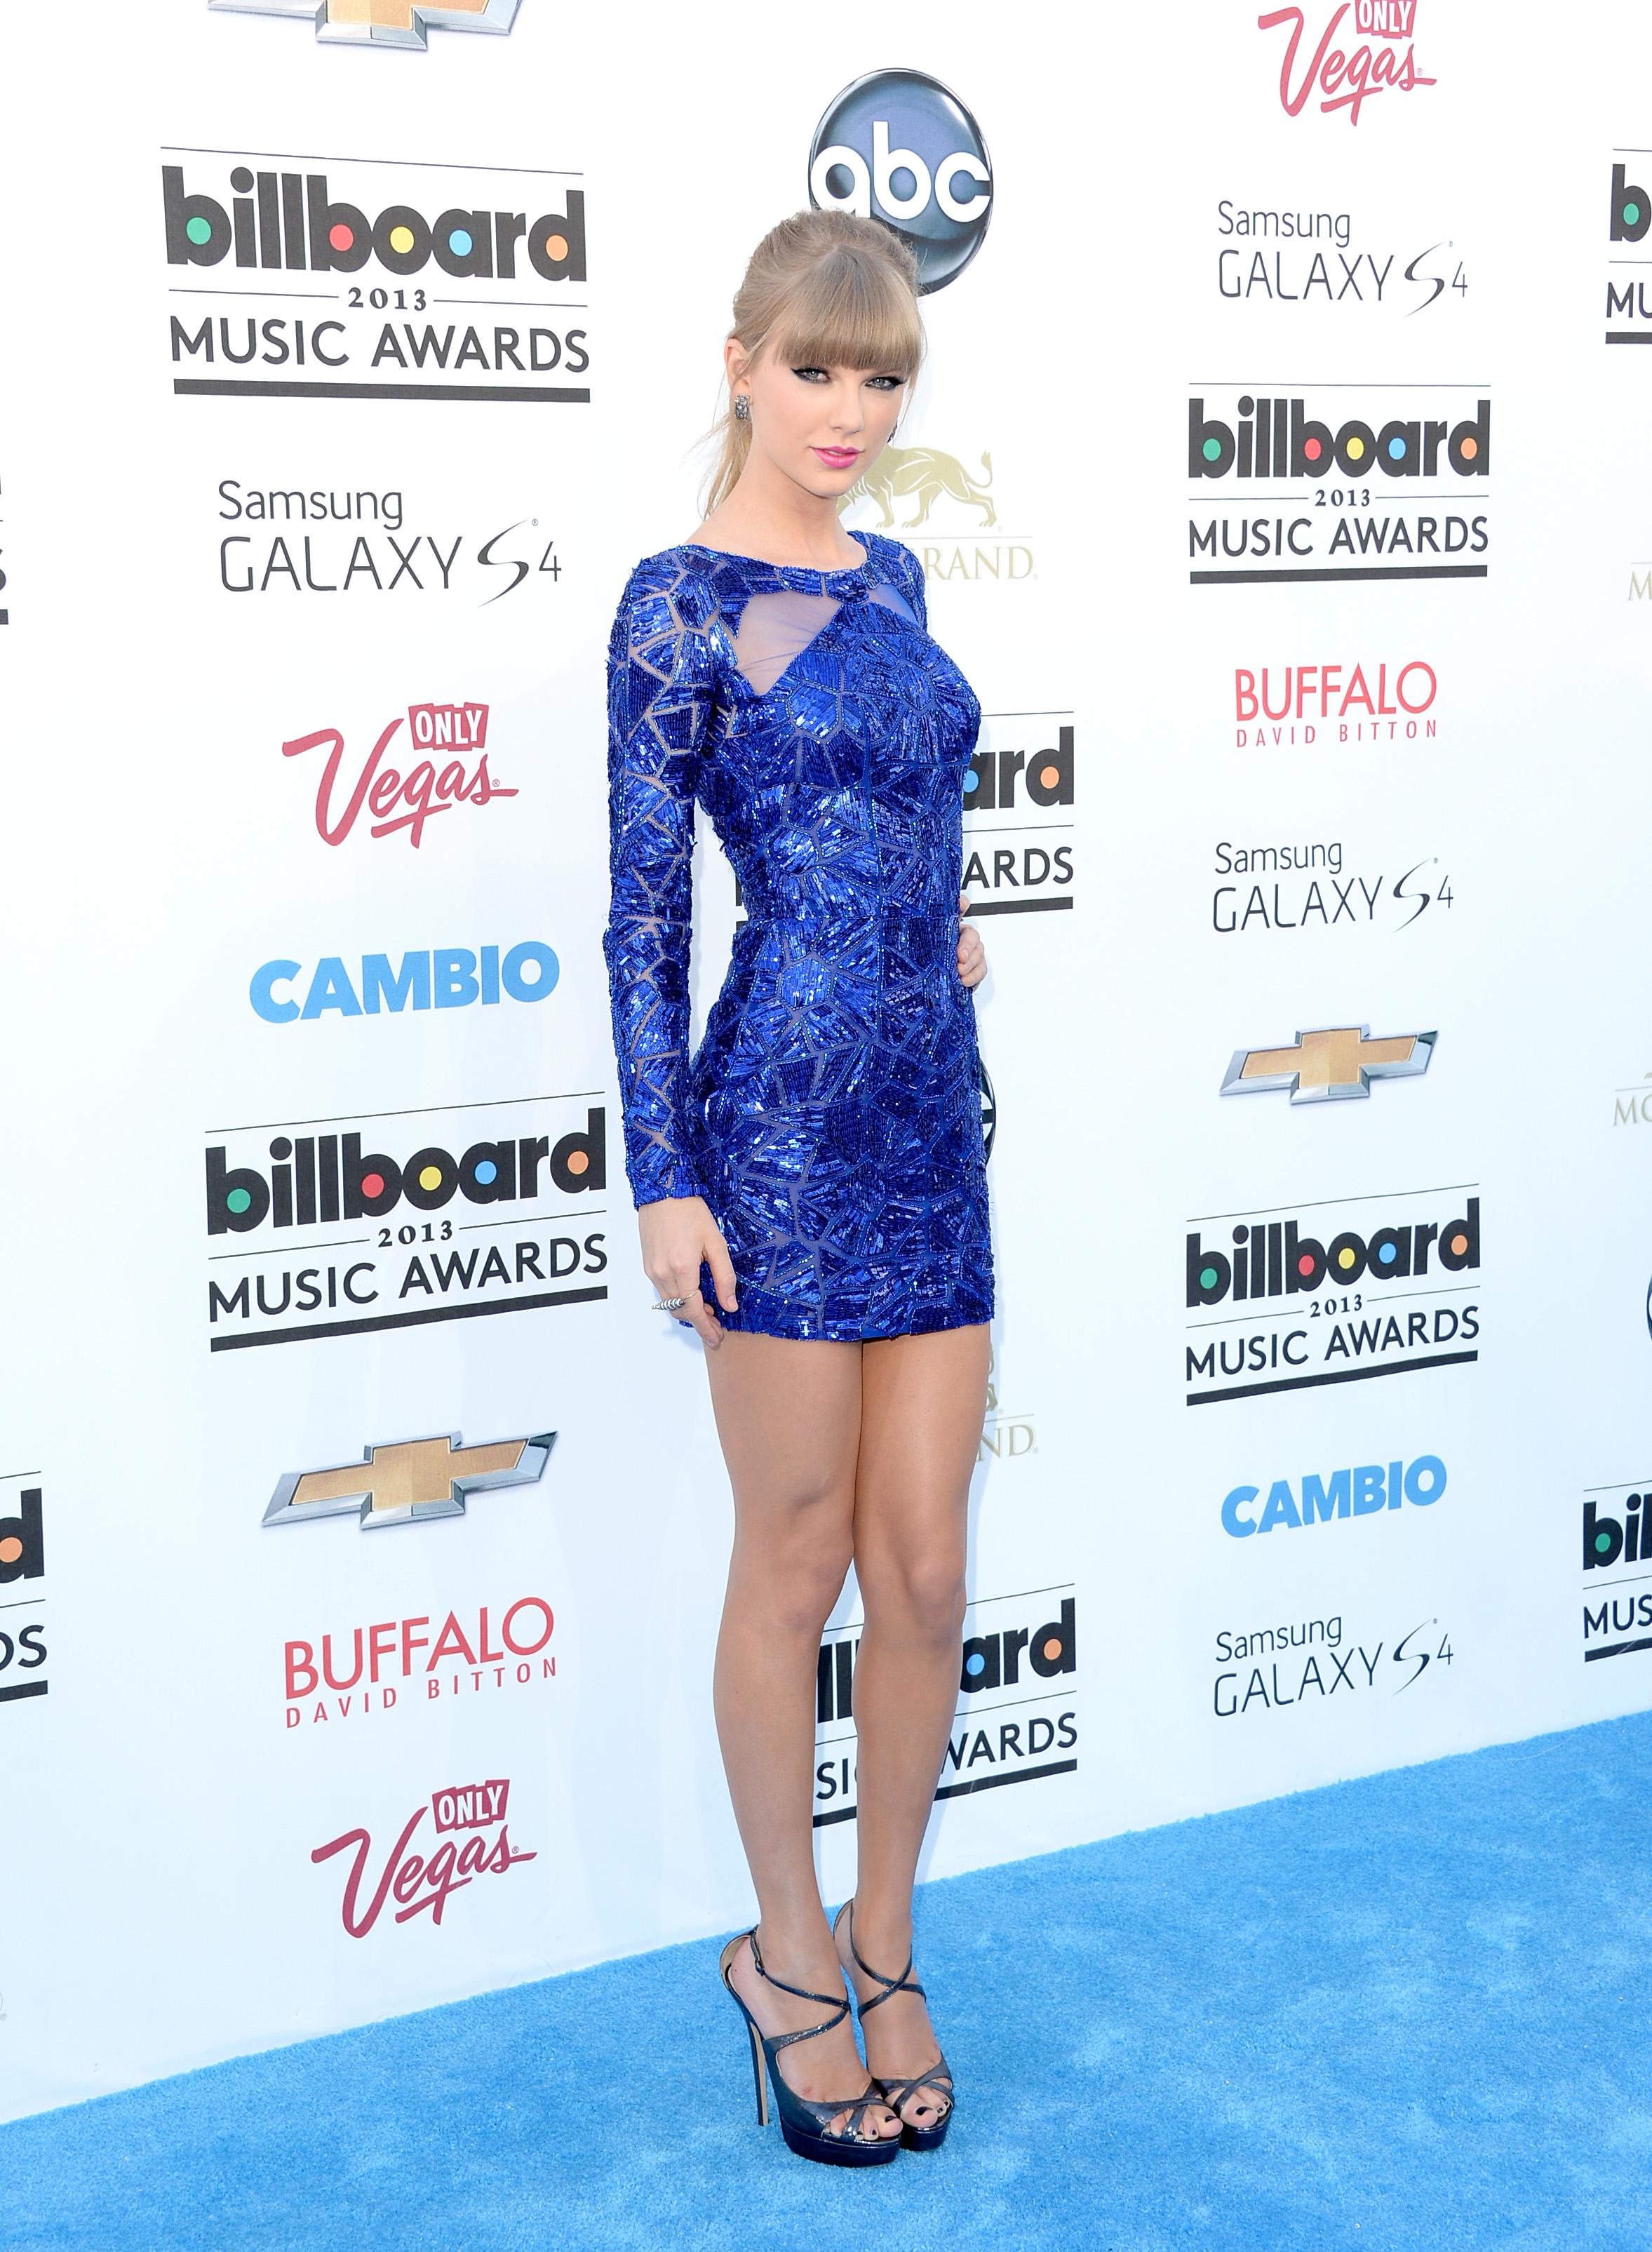 Pigeon Toed Celebrities Billboard Music Awards...